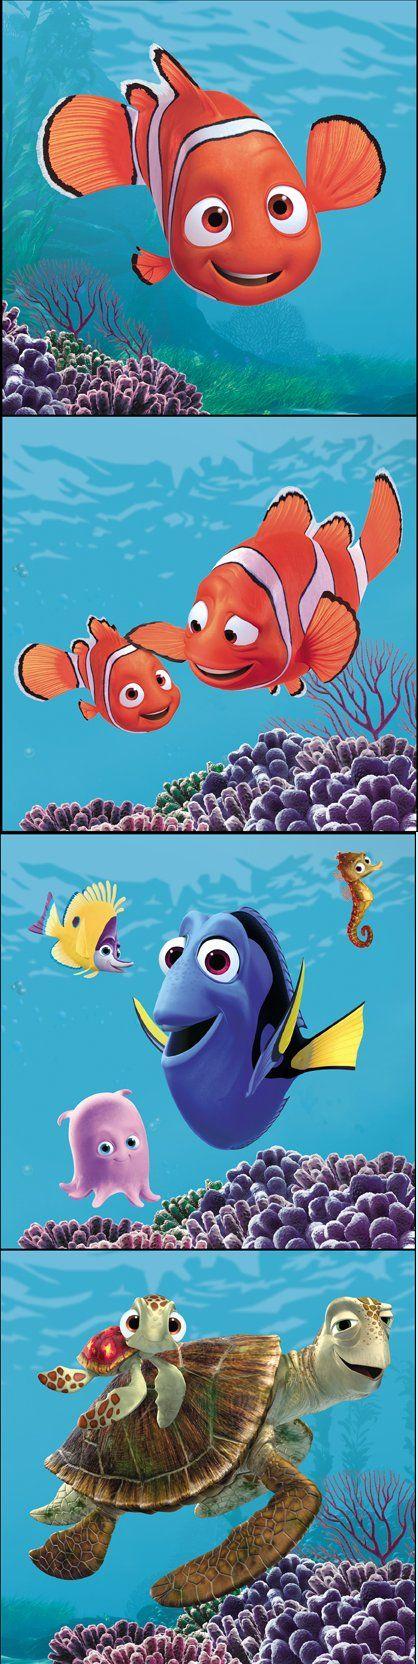 I love these guys!!!  Especially Crush!!  Koo Koo KaChoo!!